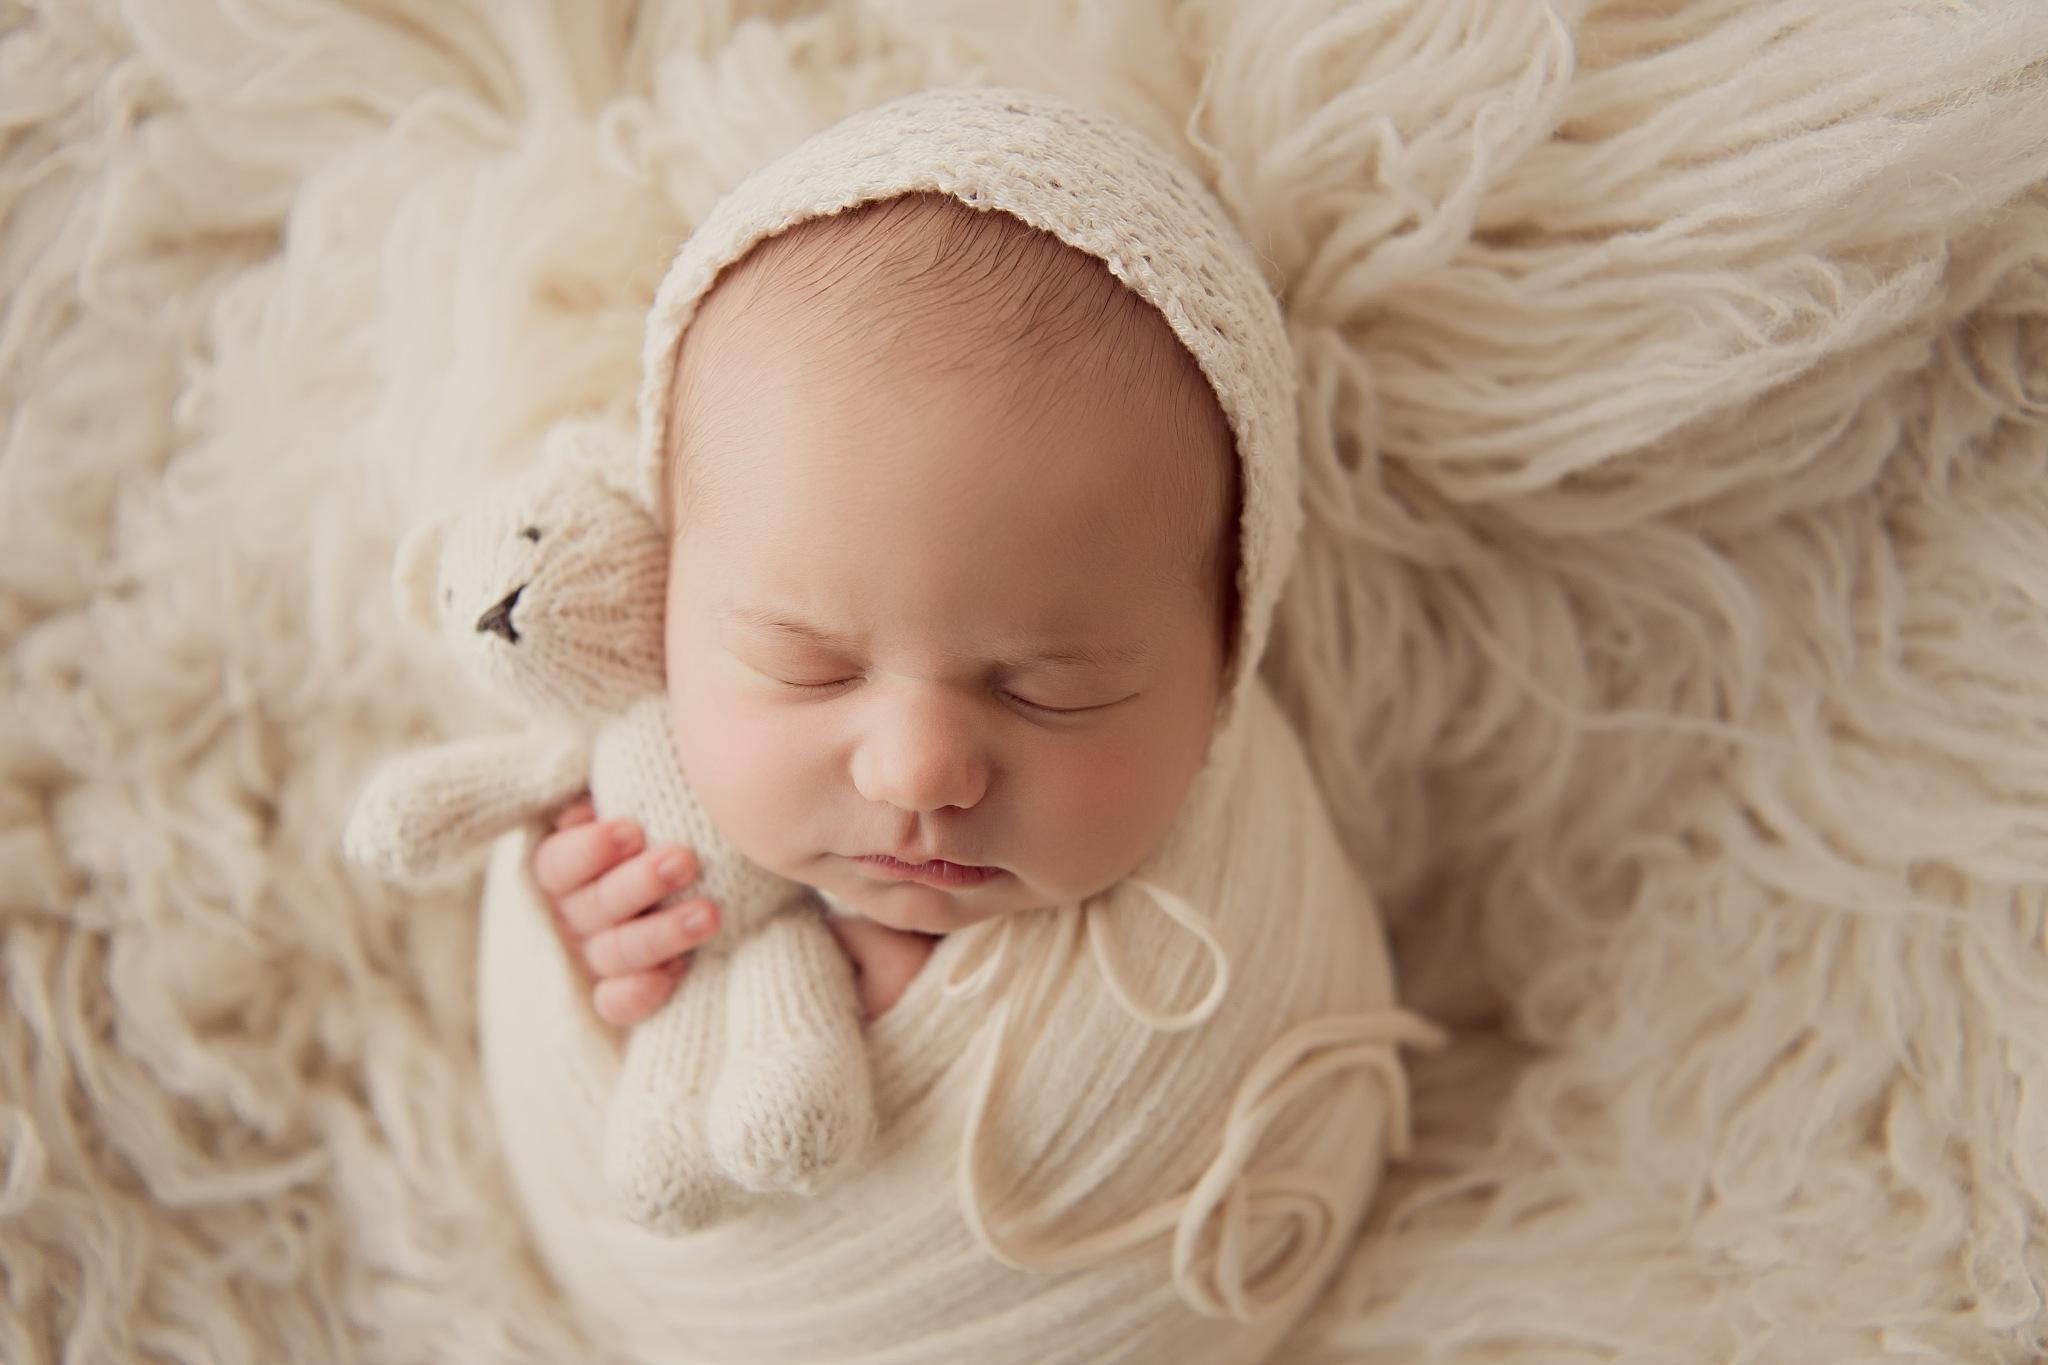 Bri Sullivan Photography - The Woodlands, Texas Newborn and Baby Portrait Photography by cherrystreetphoto